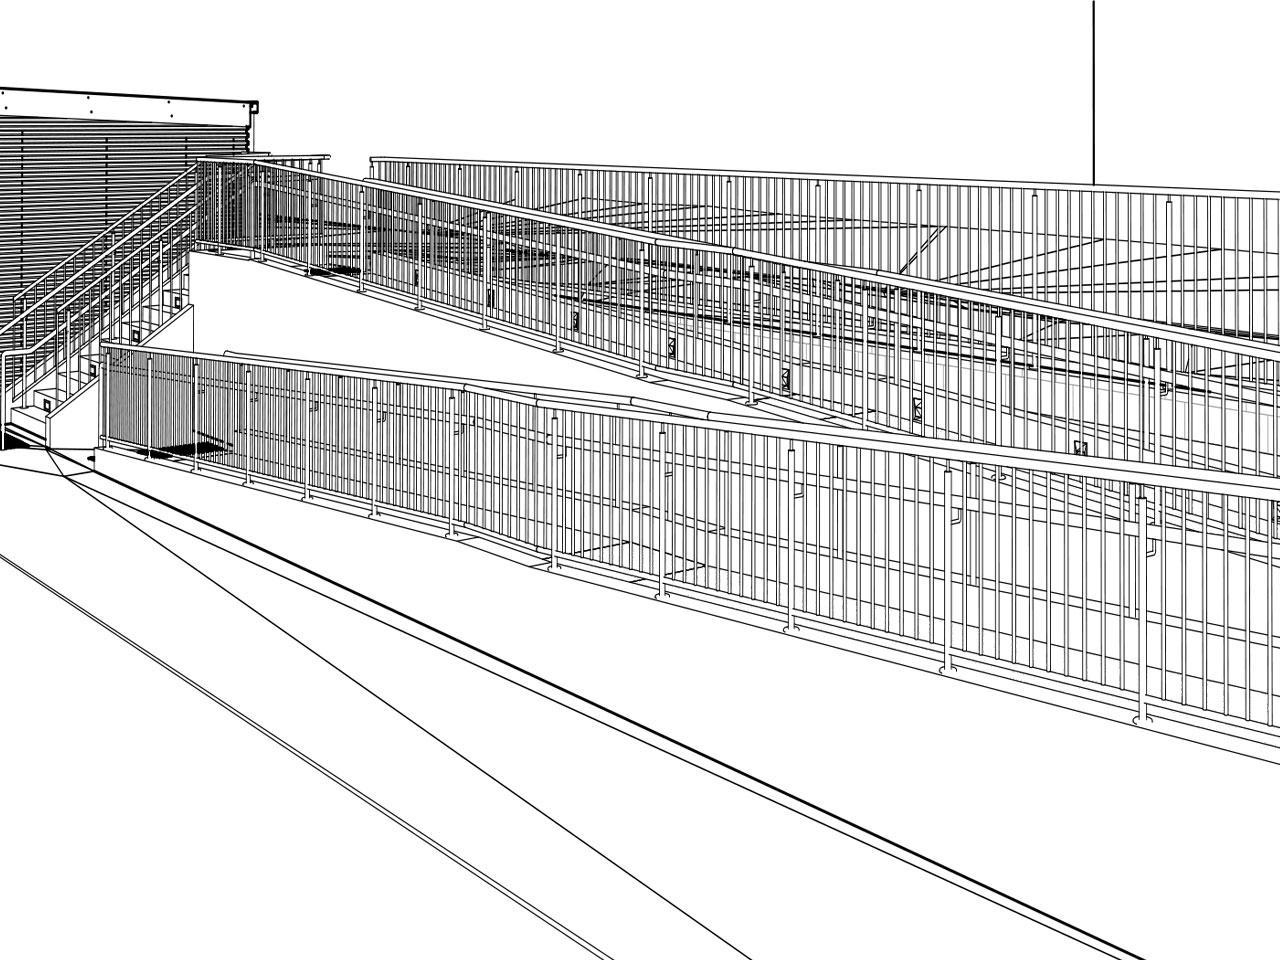 Handrails-and-Balustrades-Melbourne-Victoria-Mechcon-BOSCH-Clayton-Head-Office-1280x960px